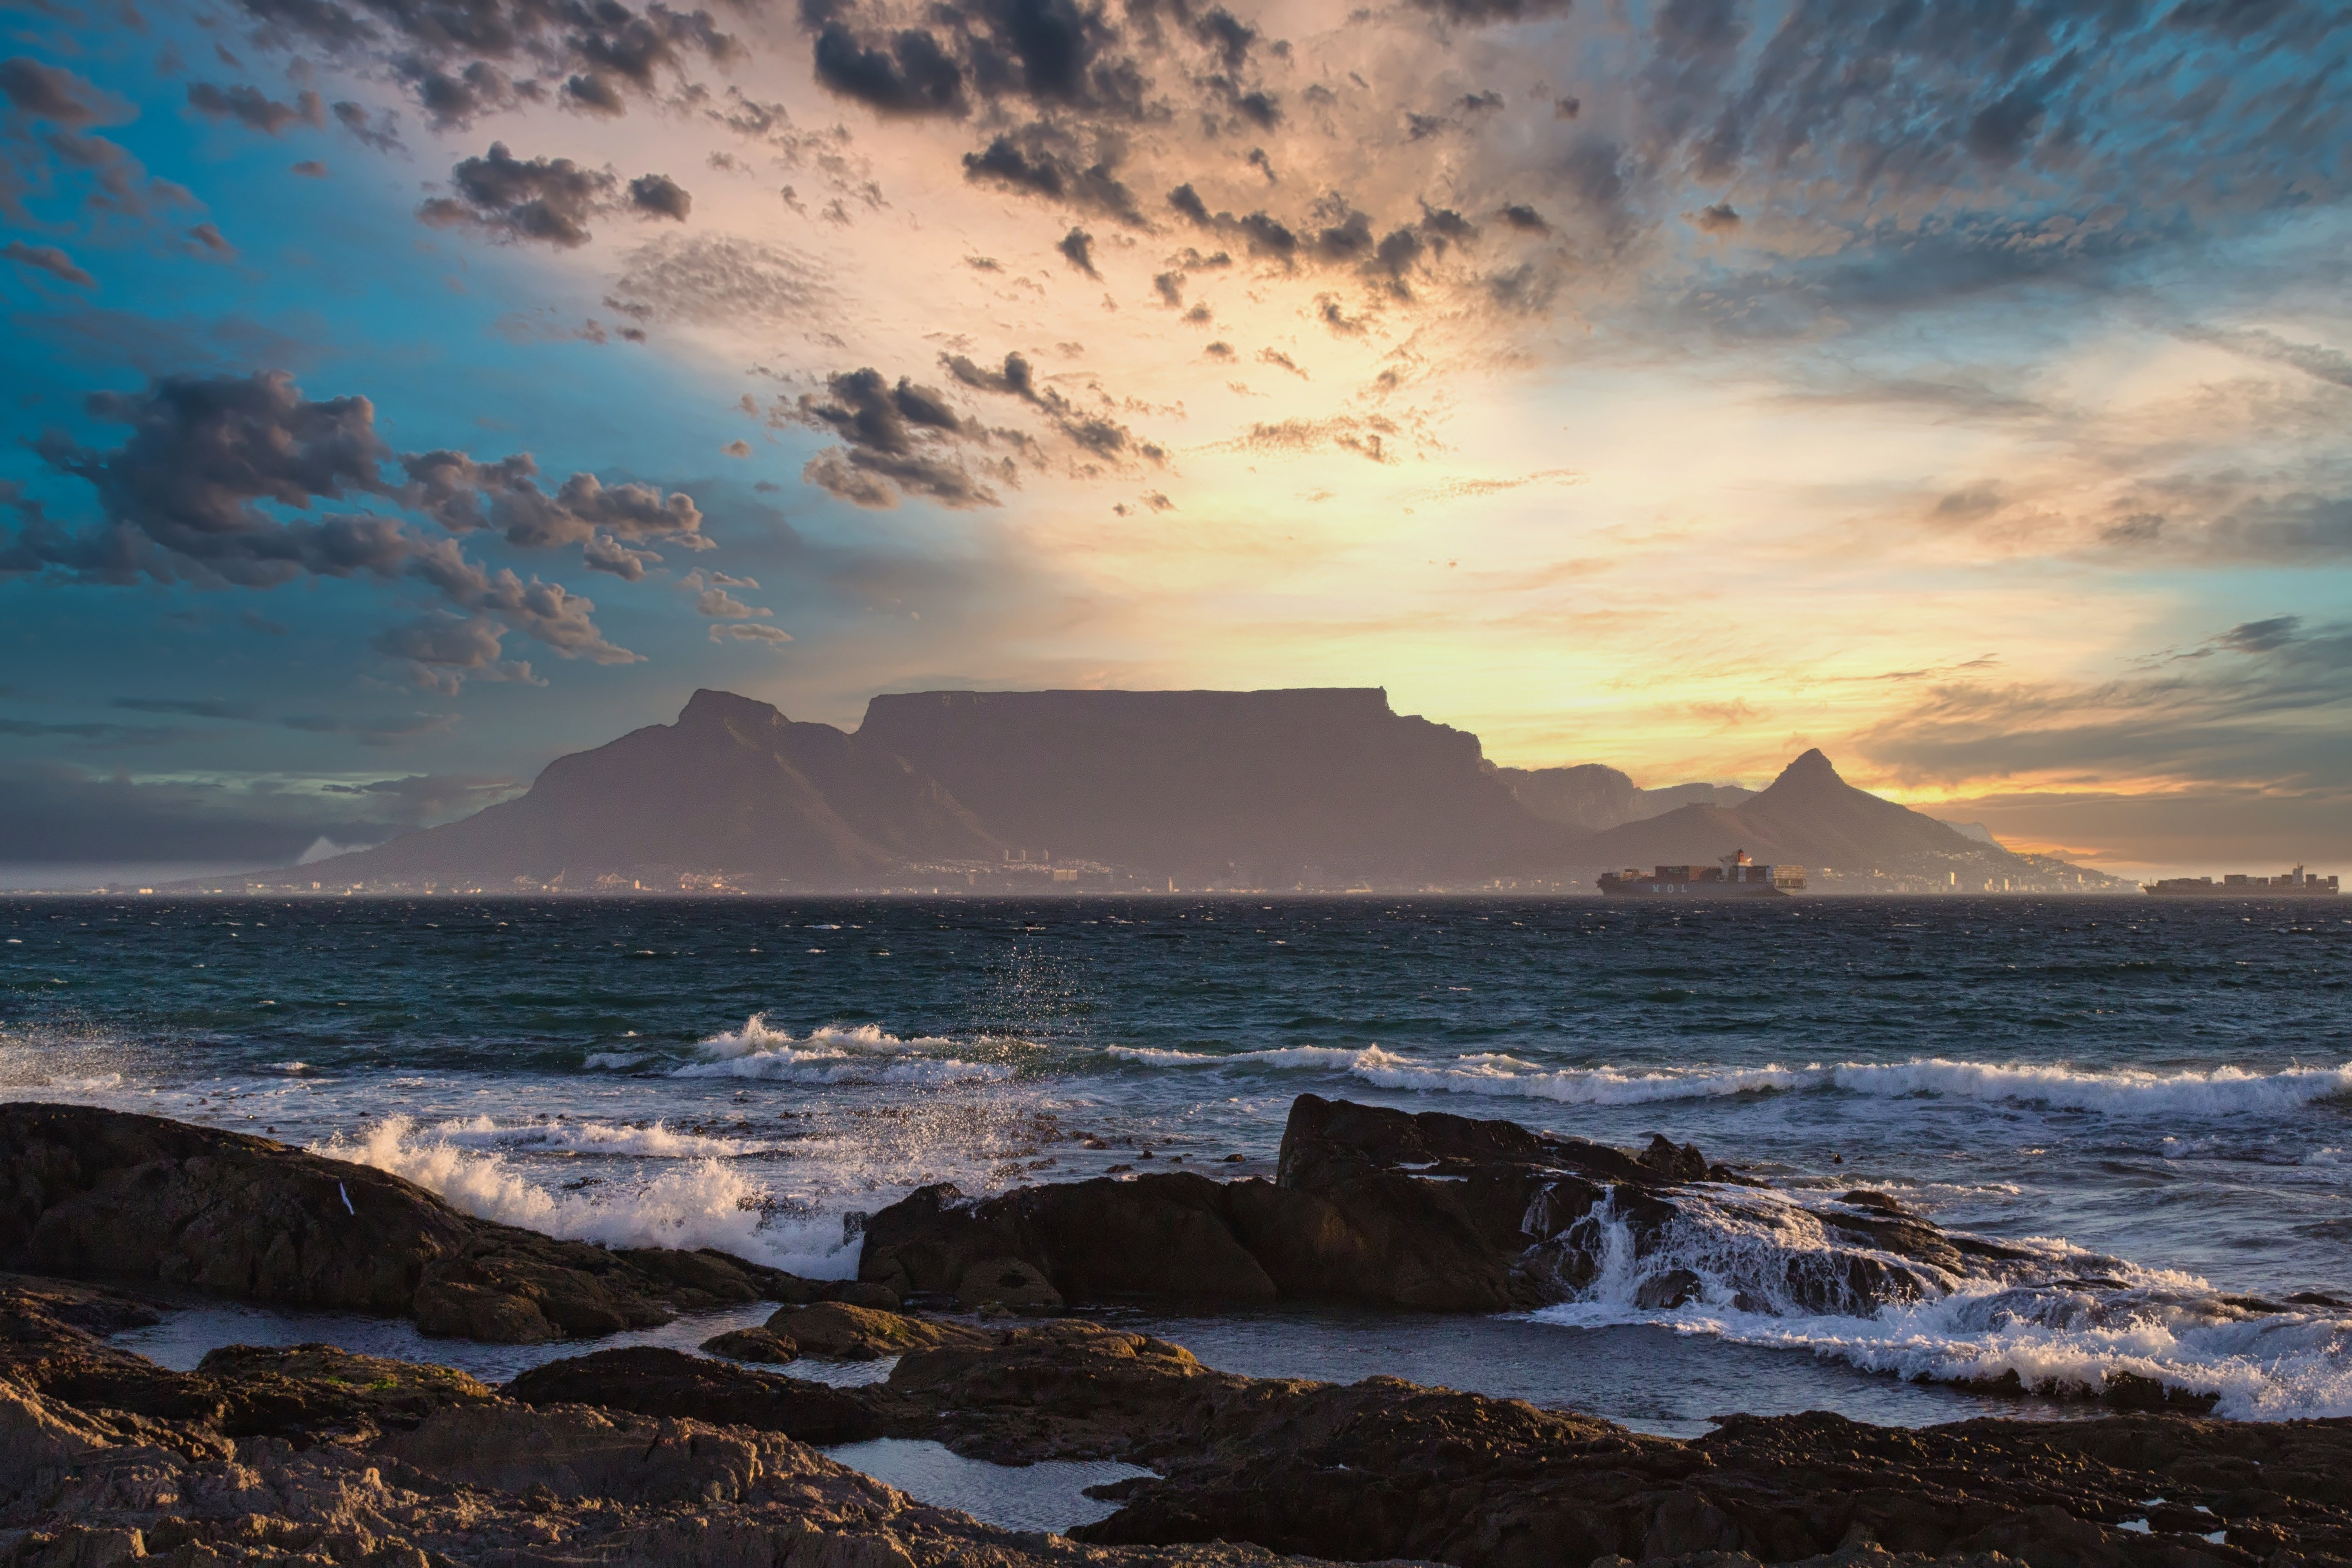 Wallpaper Sunset at the coast